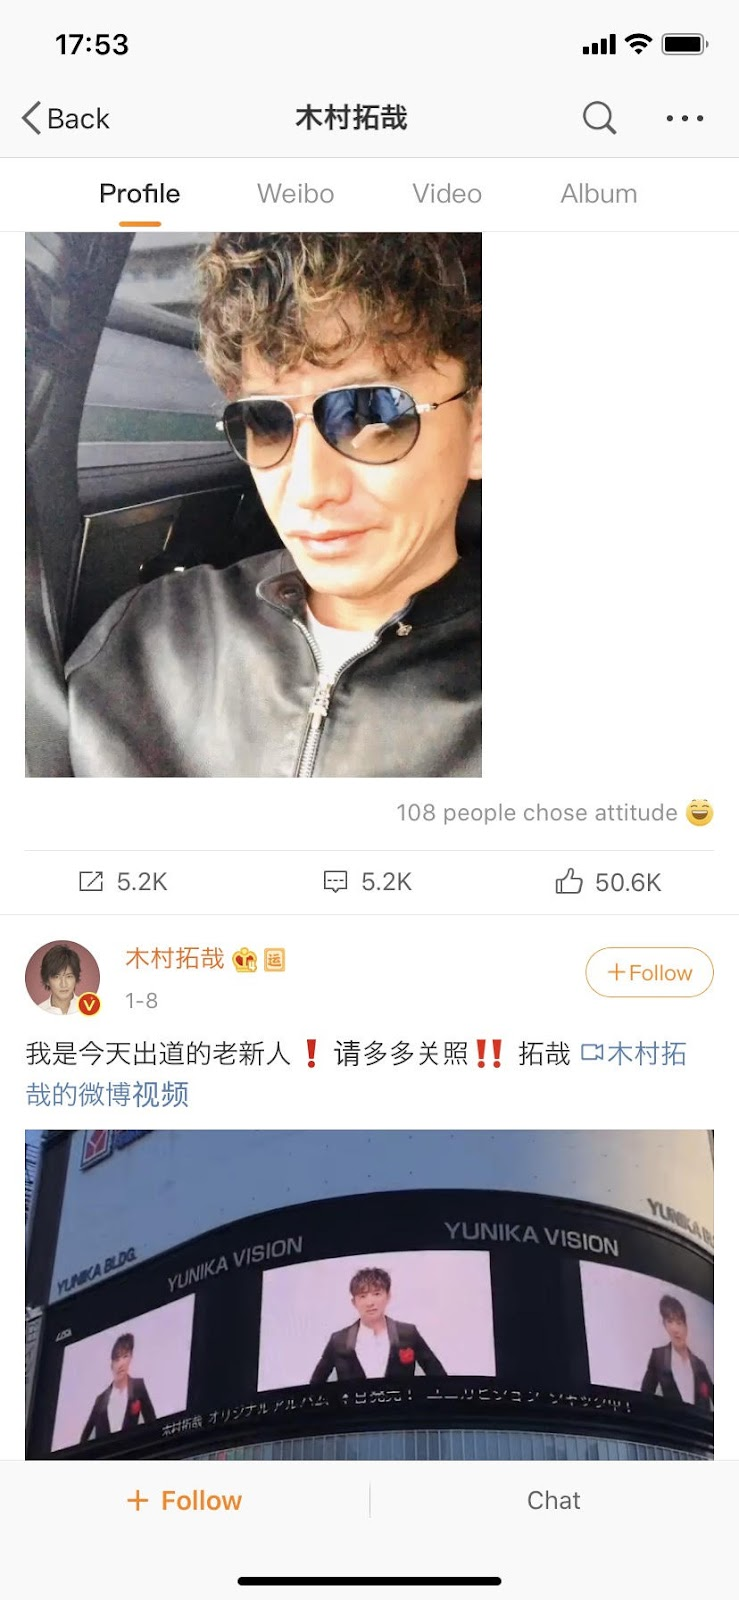 Weibo ここ み 初心者向け!微博(weibo)の入門講座①|基本・用語・使い方を解説【中国SNS】|ゆーちゃん/中国SNSマーケティング研究|note